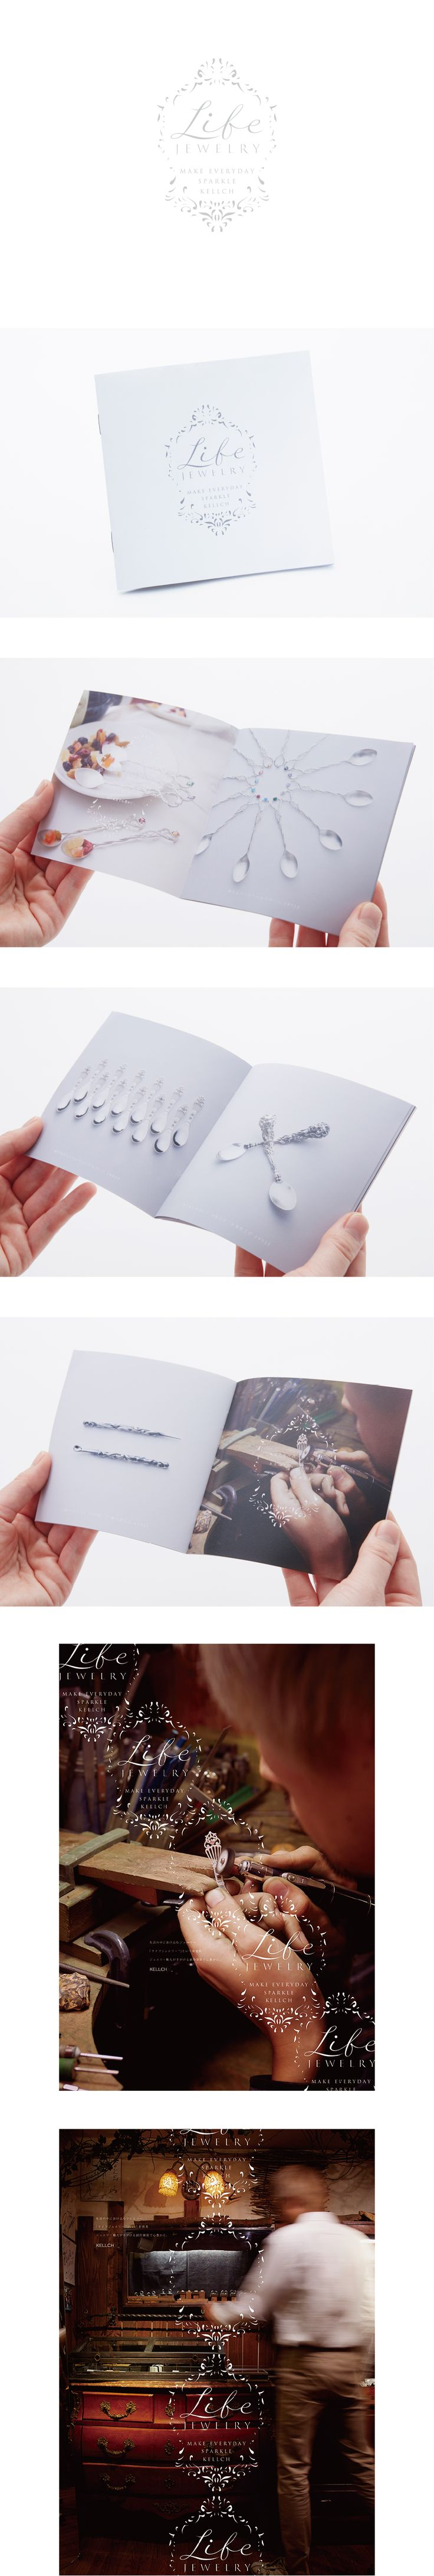 WORKS : LUCK SHOW   東北・仙台のブランディング/デザイン/広告制作